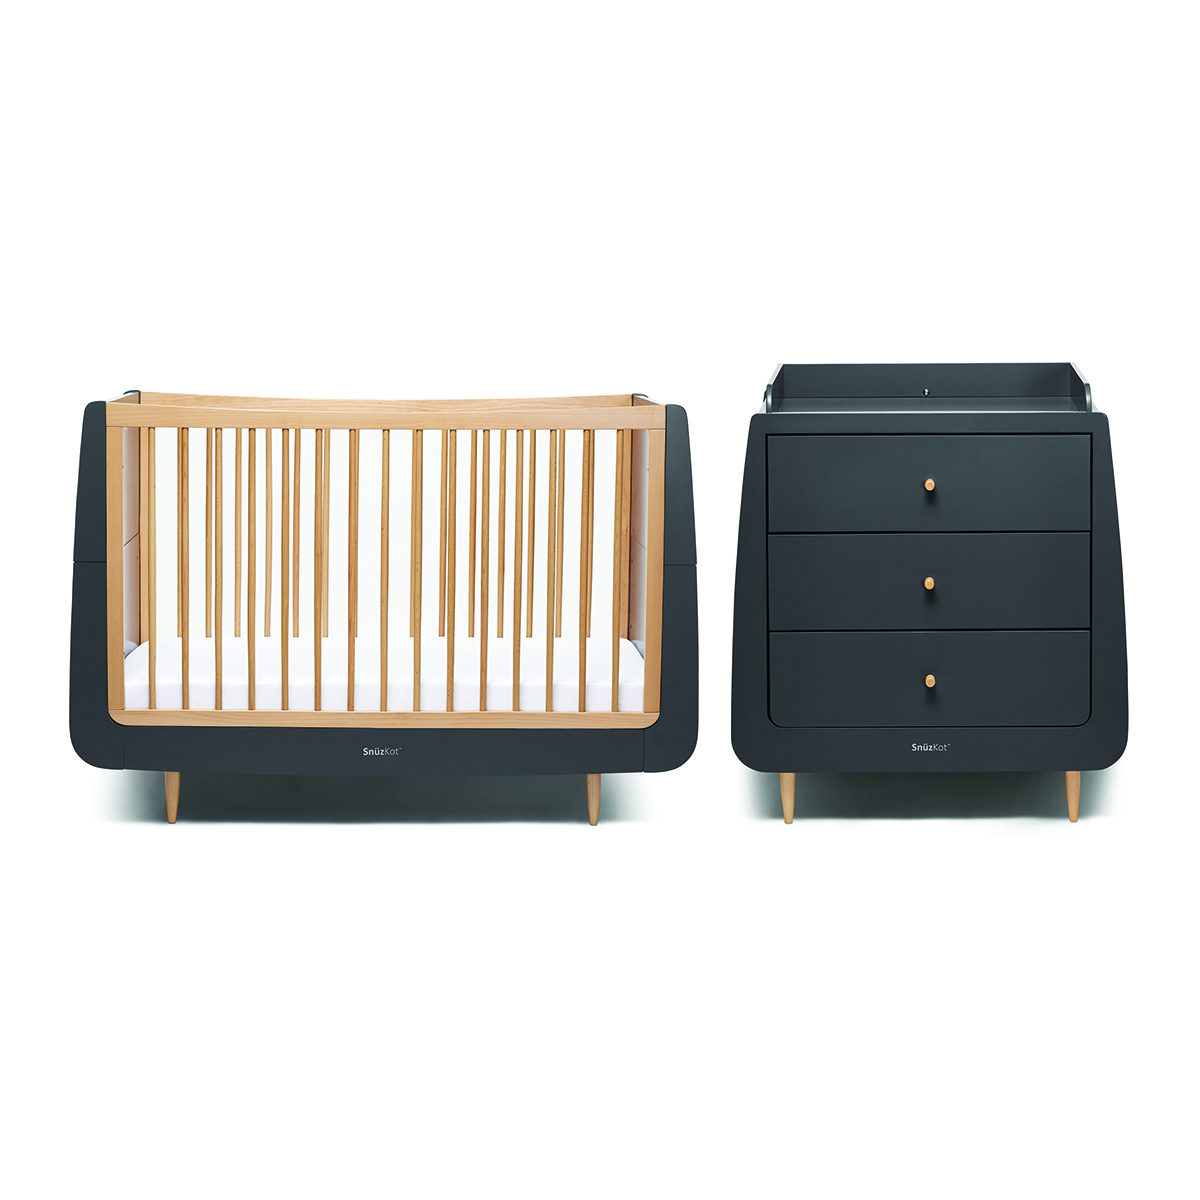 SnuzKot Skandi 2 Piece Nursery Furniture Set - Slate (SAVE £50)